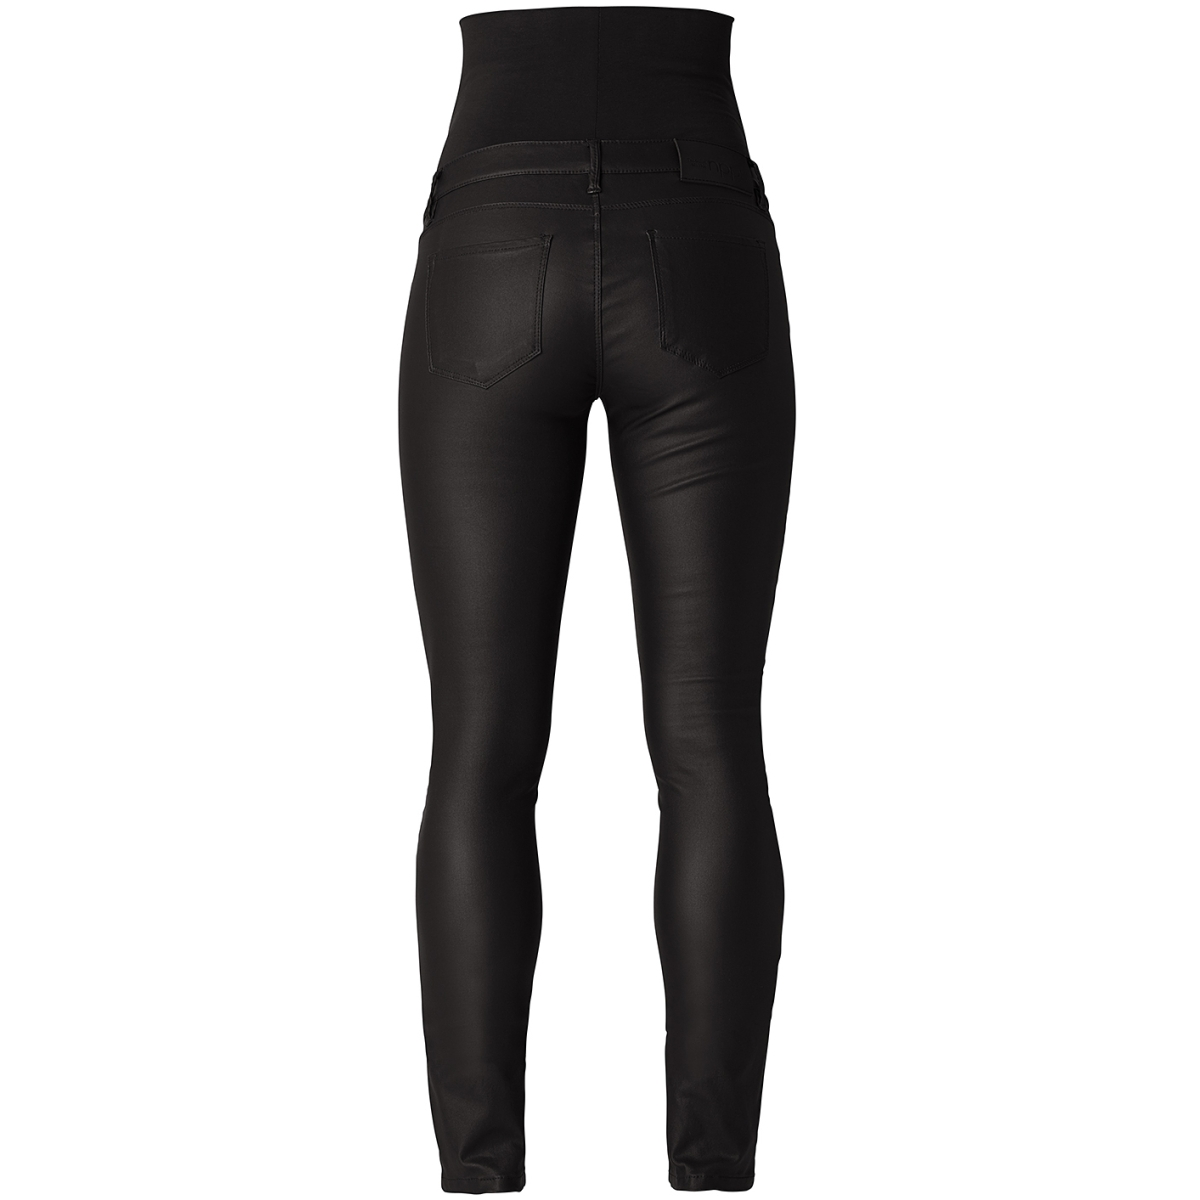 70831 jeans jessie noppies positie broek black